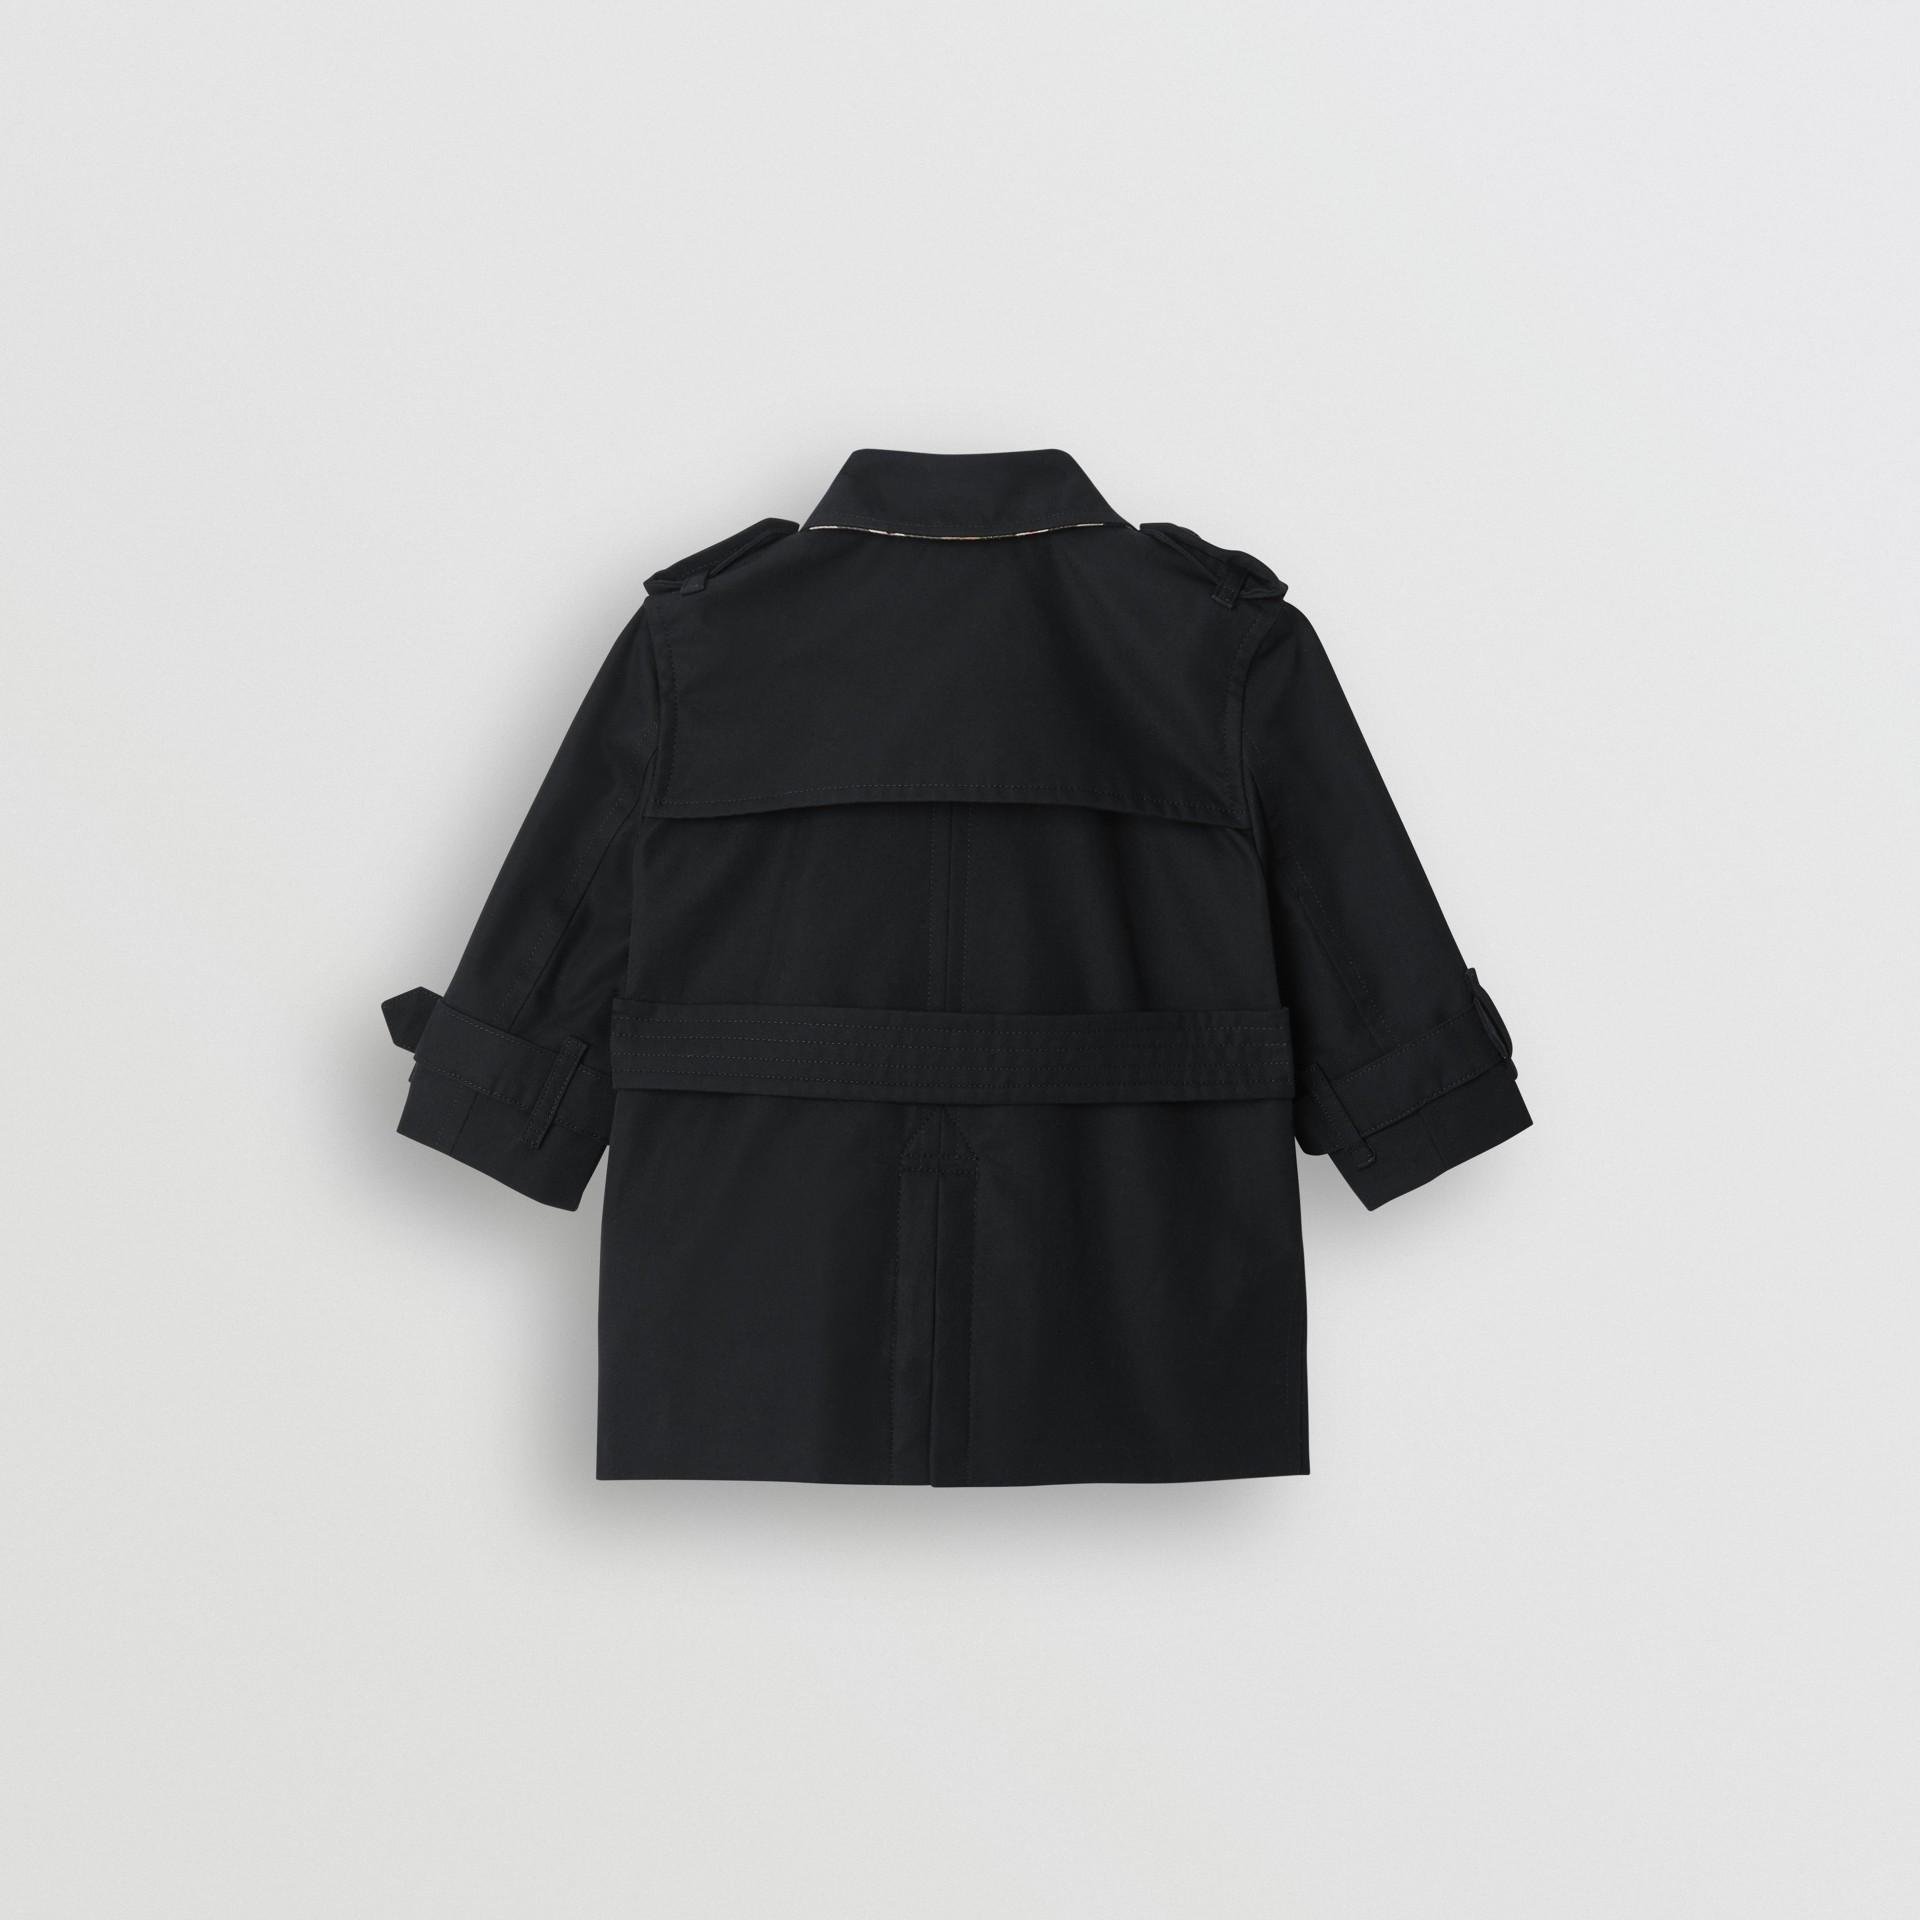 Cotton Gabardine Trench Coat in Black - Children | Burberry United Kingdom - gallery image 4